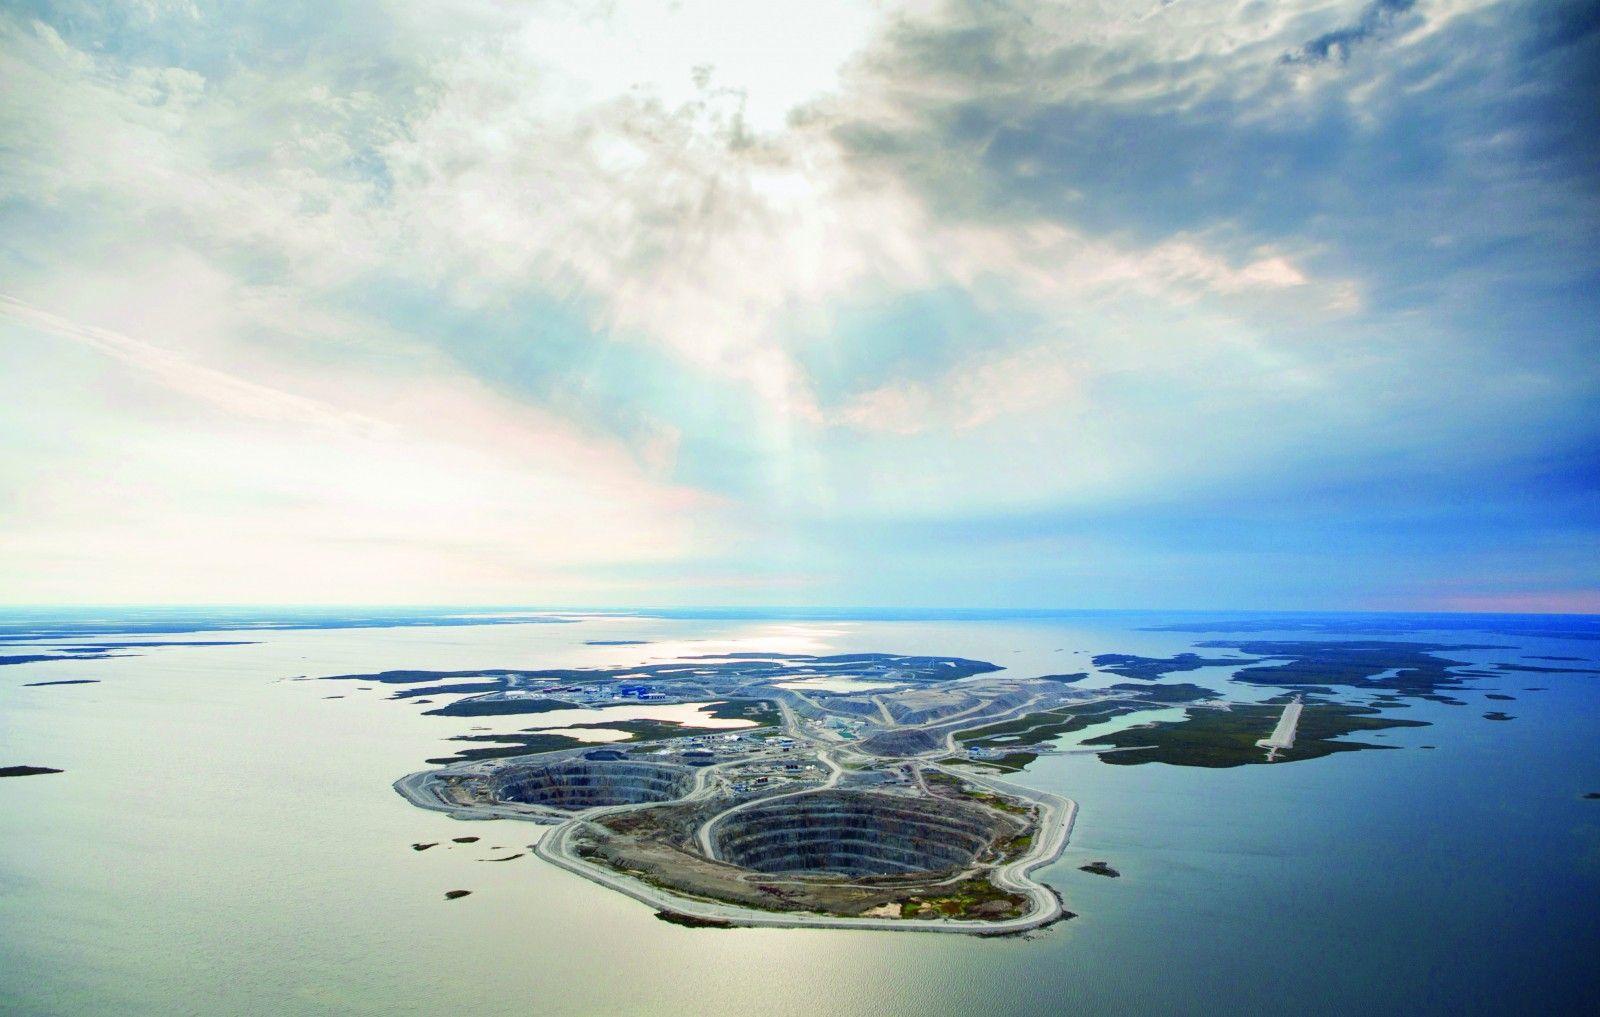 The World's most photogenic mine site? Mining Magazine